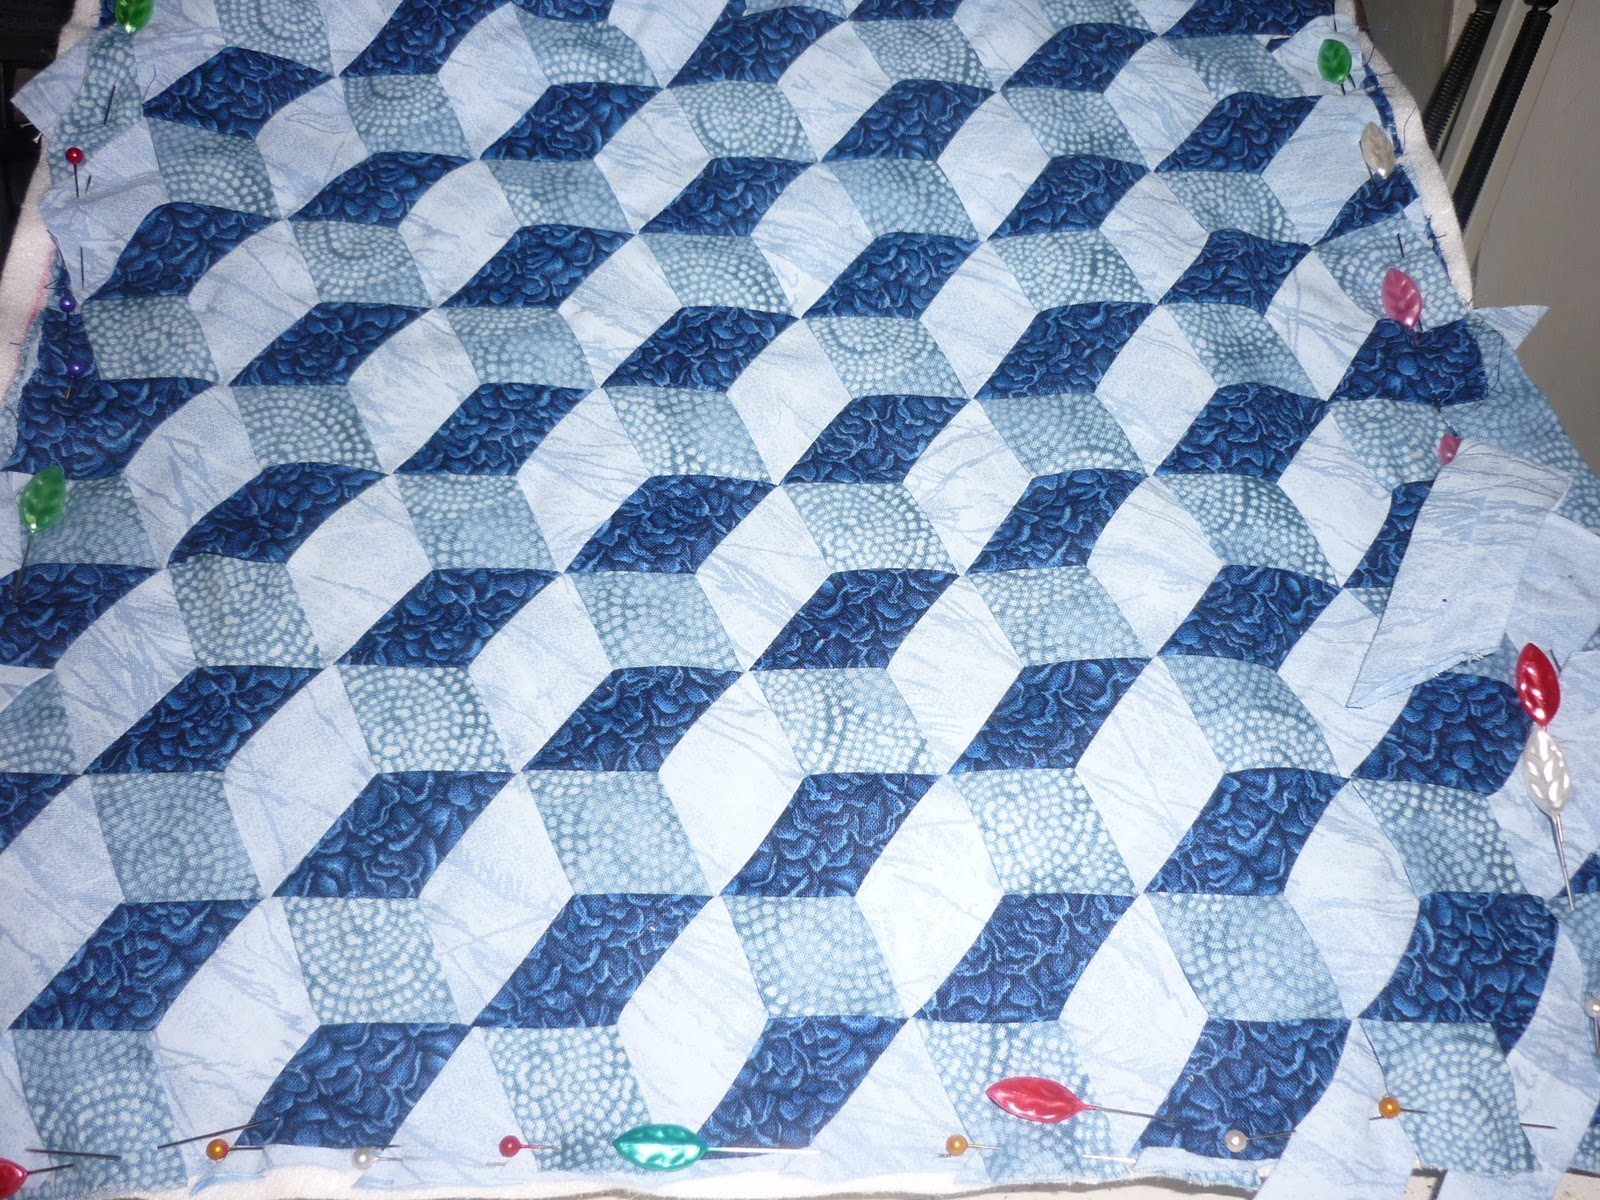 Casita del patchwork 02 mar 2011 - La casita del patchwork ...